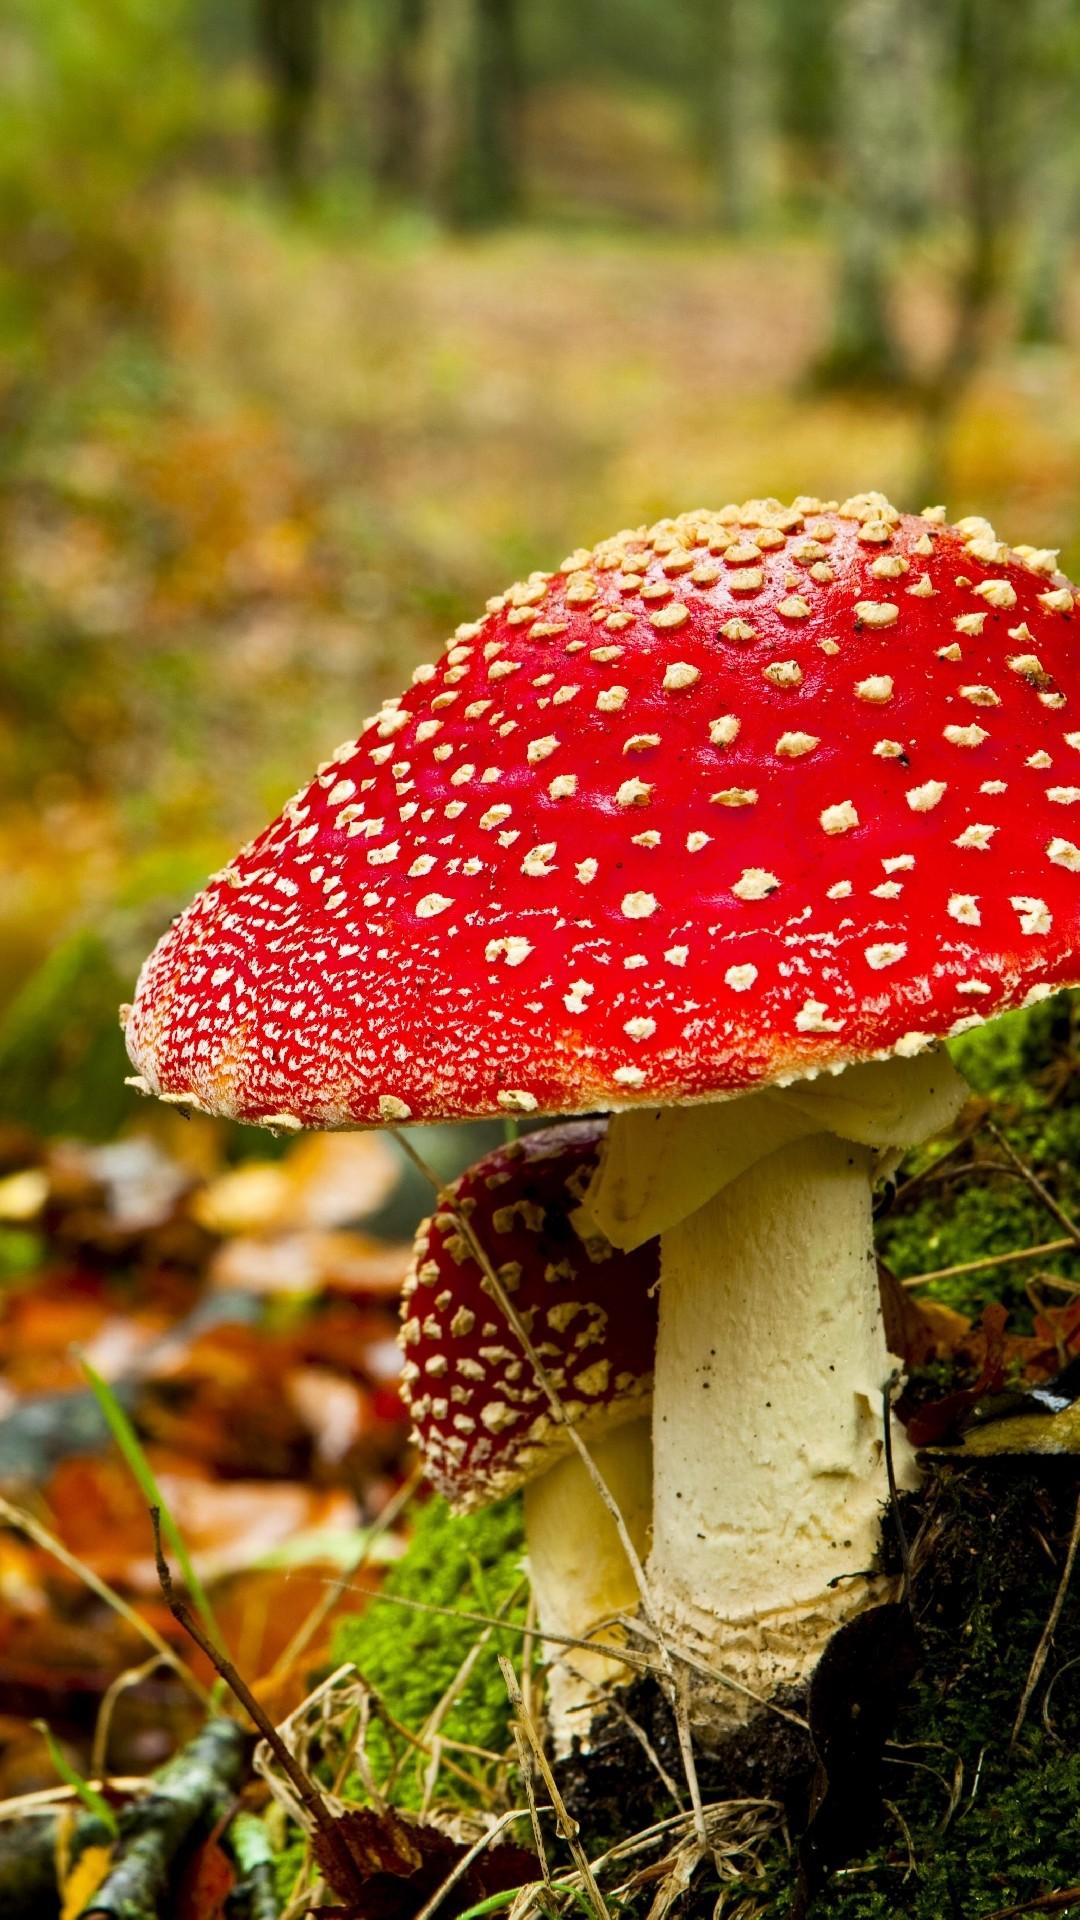 Iphone wallpaper Mushroom in Fall …